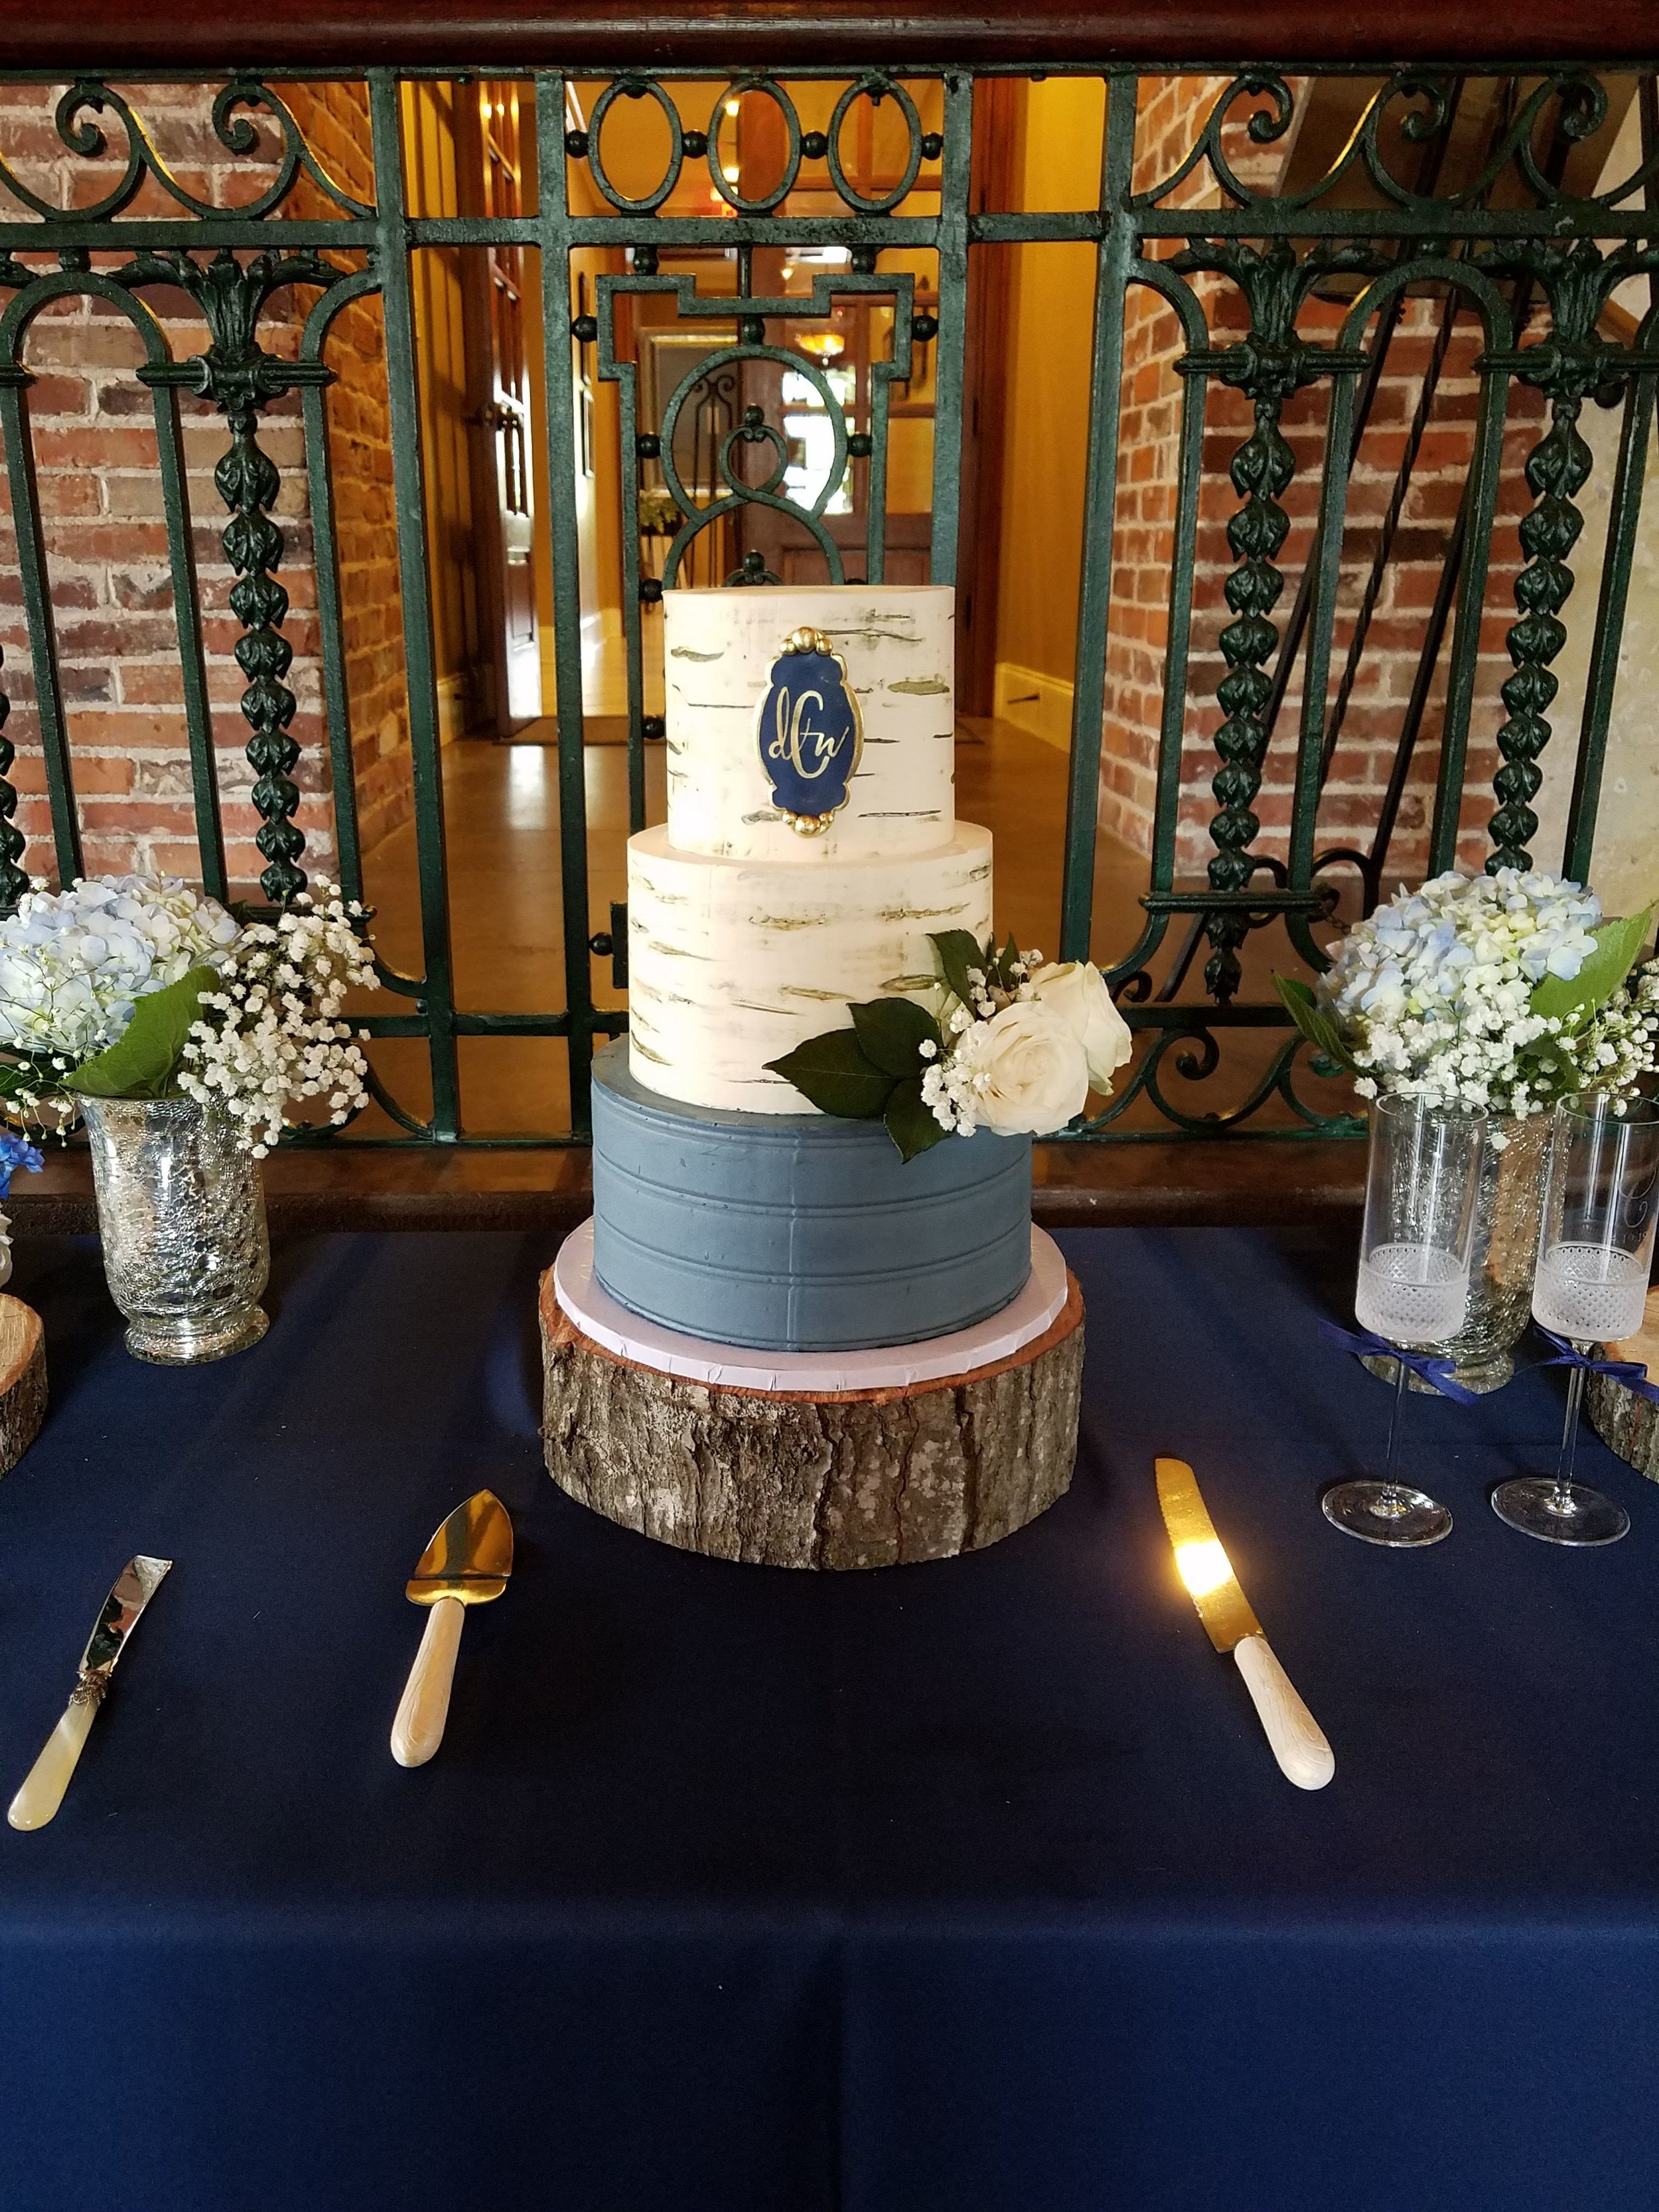 Chambers Wedding Cake 4:19.jpg